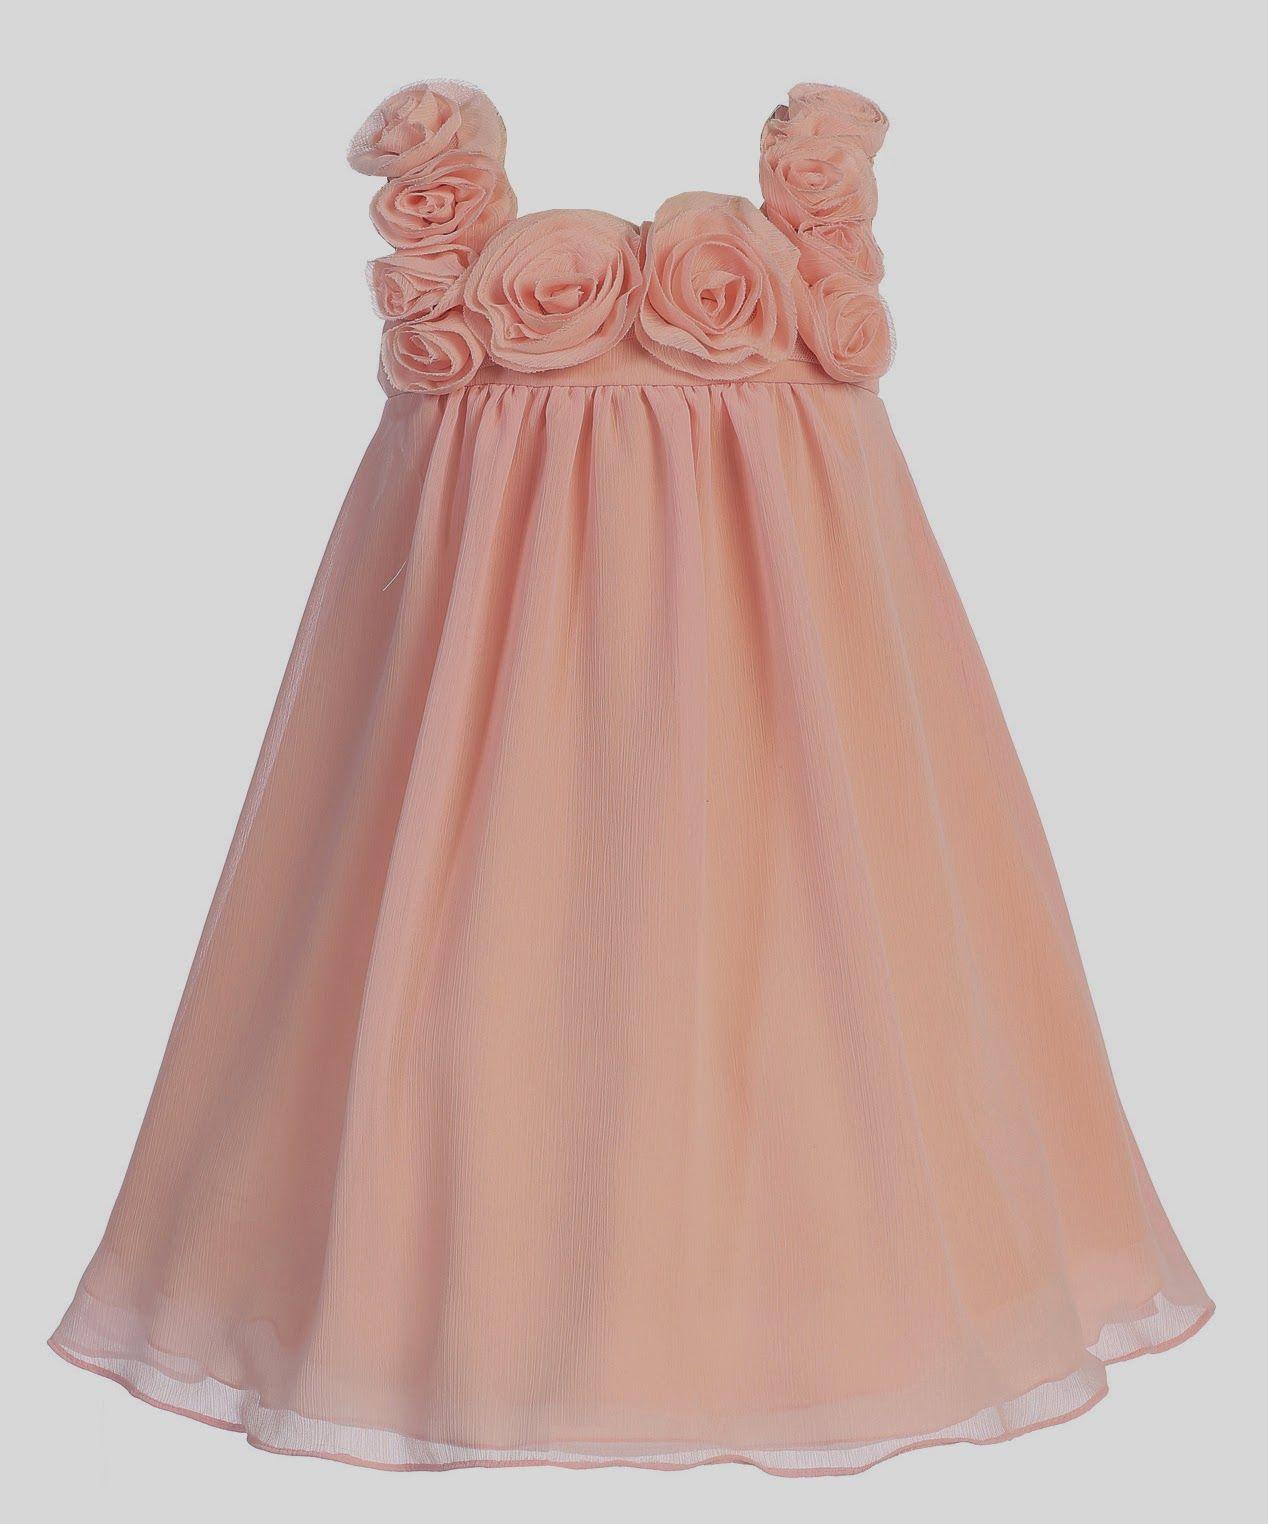 cbc8279a3 Vestidos Niña de las Flores, Color Coral | vestidos espectaculares ...